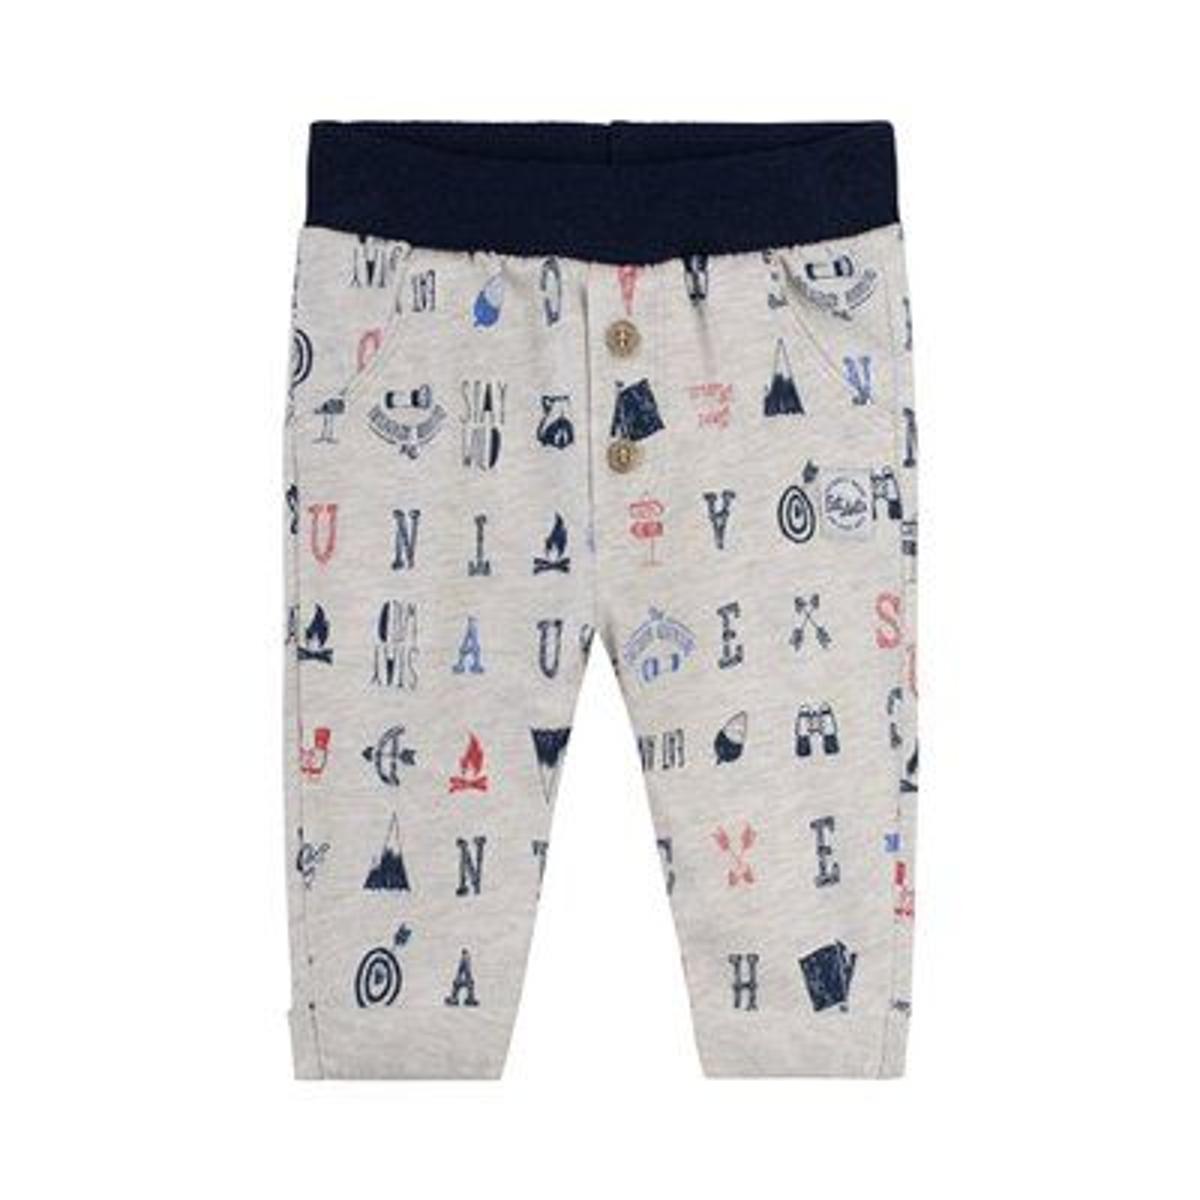 SANETTA Le pantalon de jogging Wild Life pantalon bébé pantalon enfant